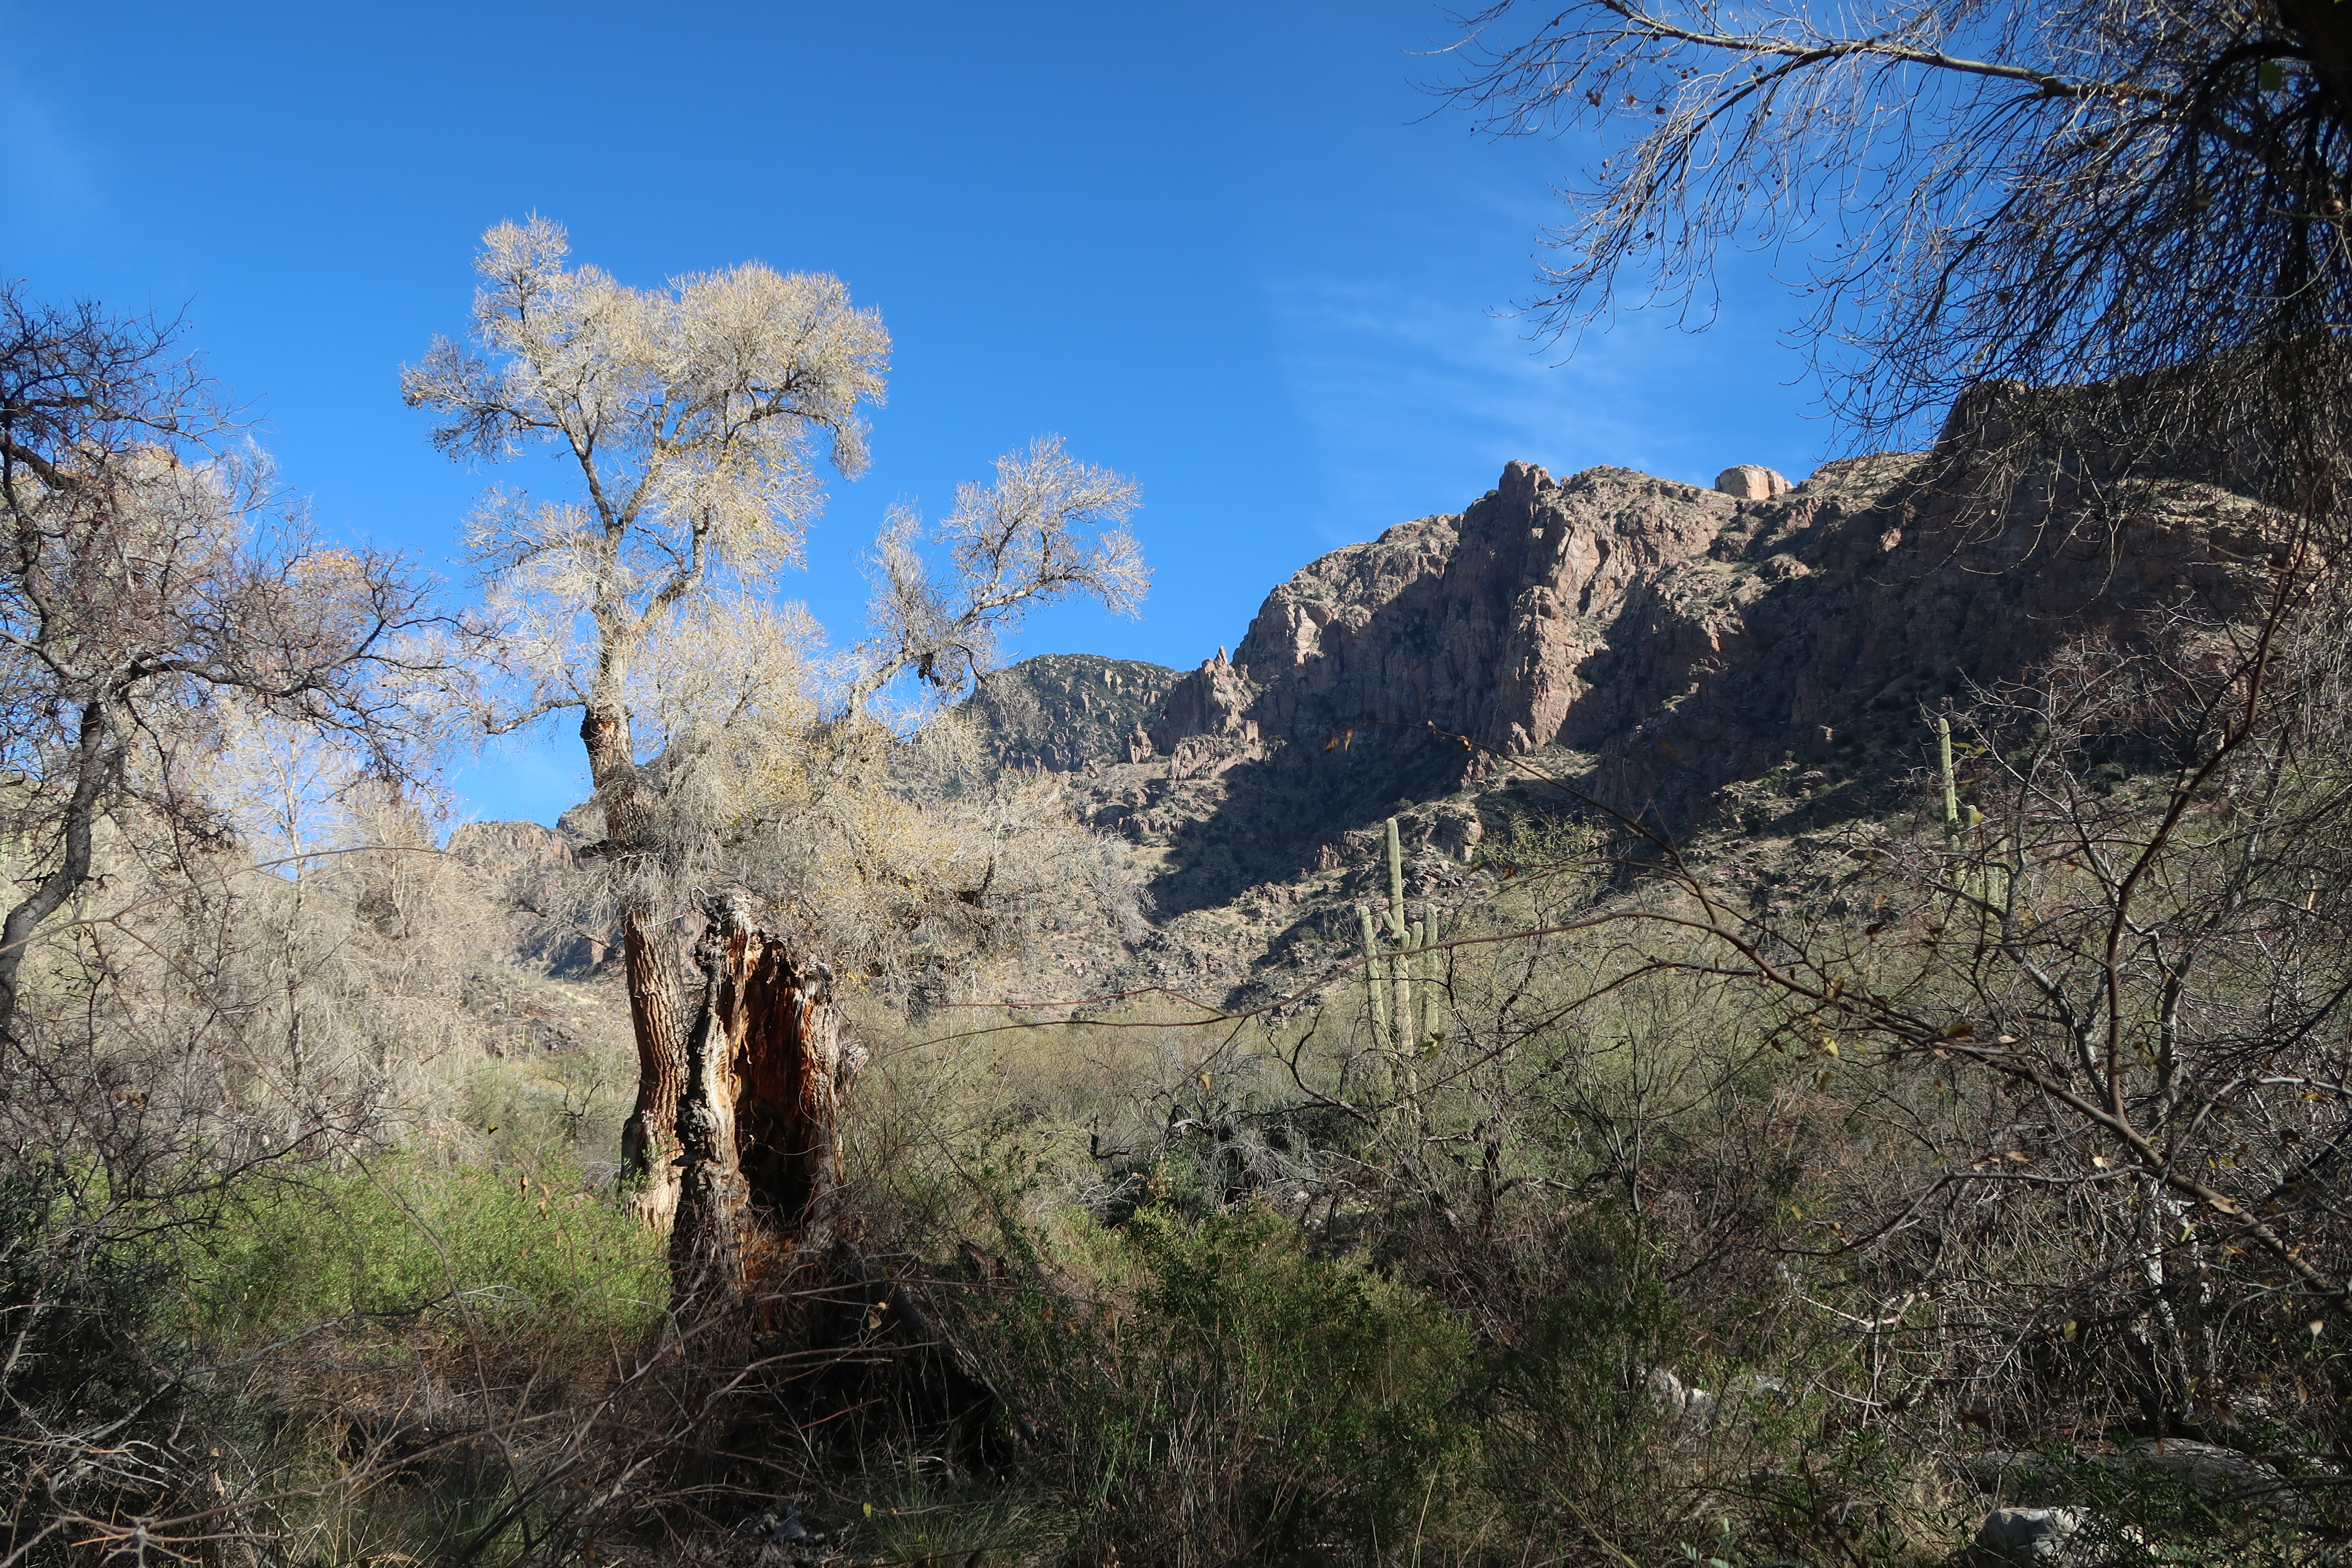 Pima canyon trail head green oasis